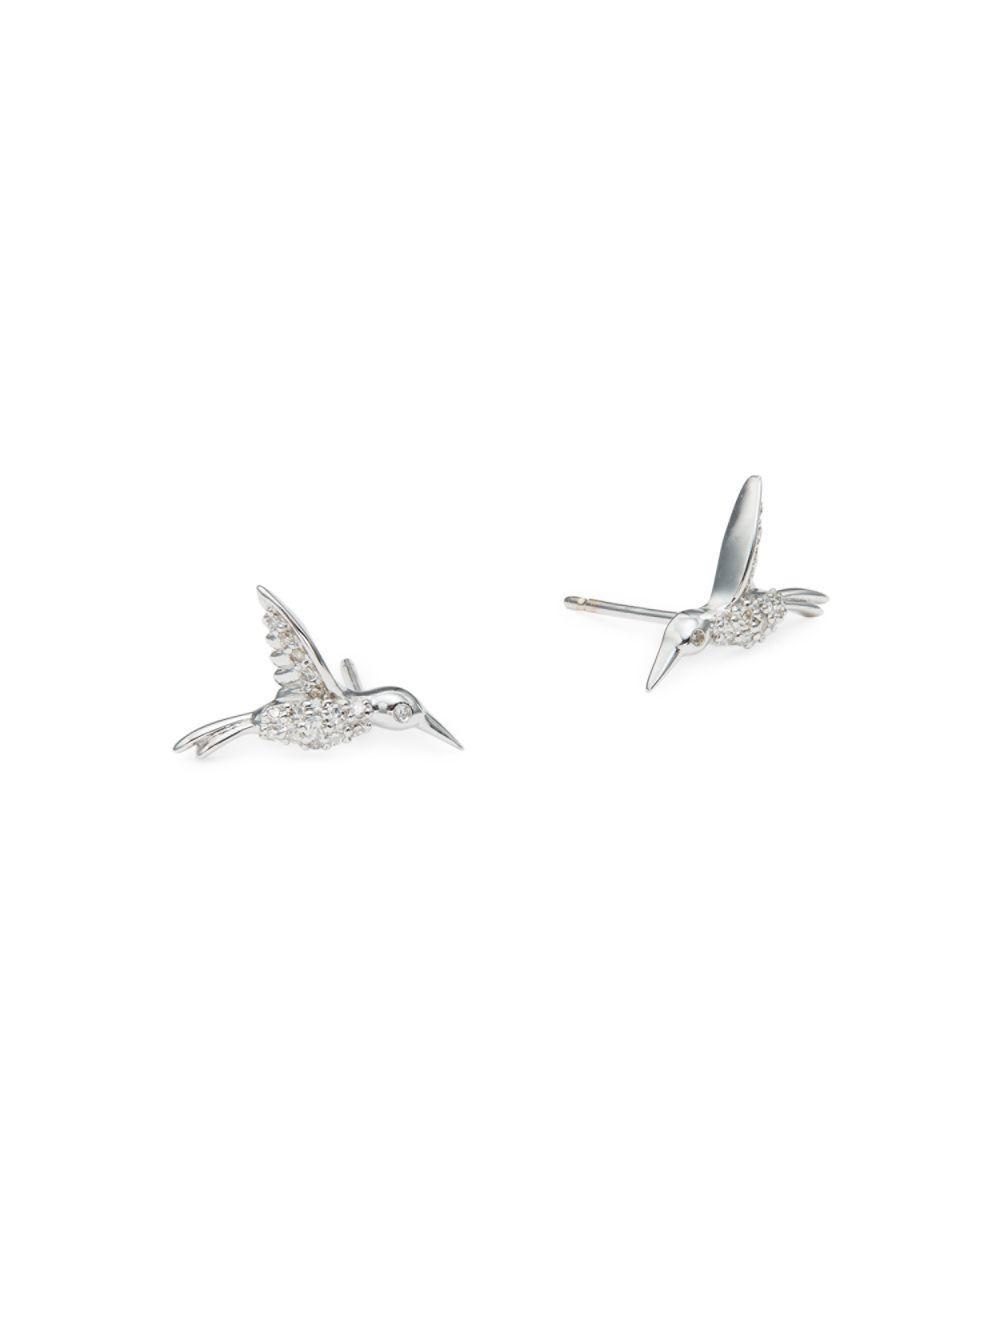 Lyst - Danni Diamond And 14k White Gold Bird Stud Earrings in Metallic